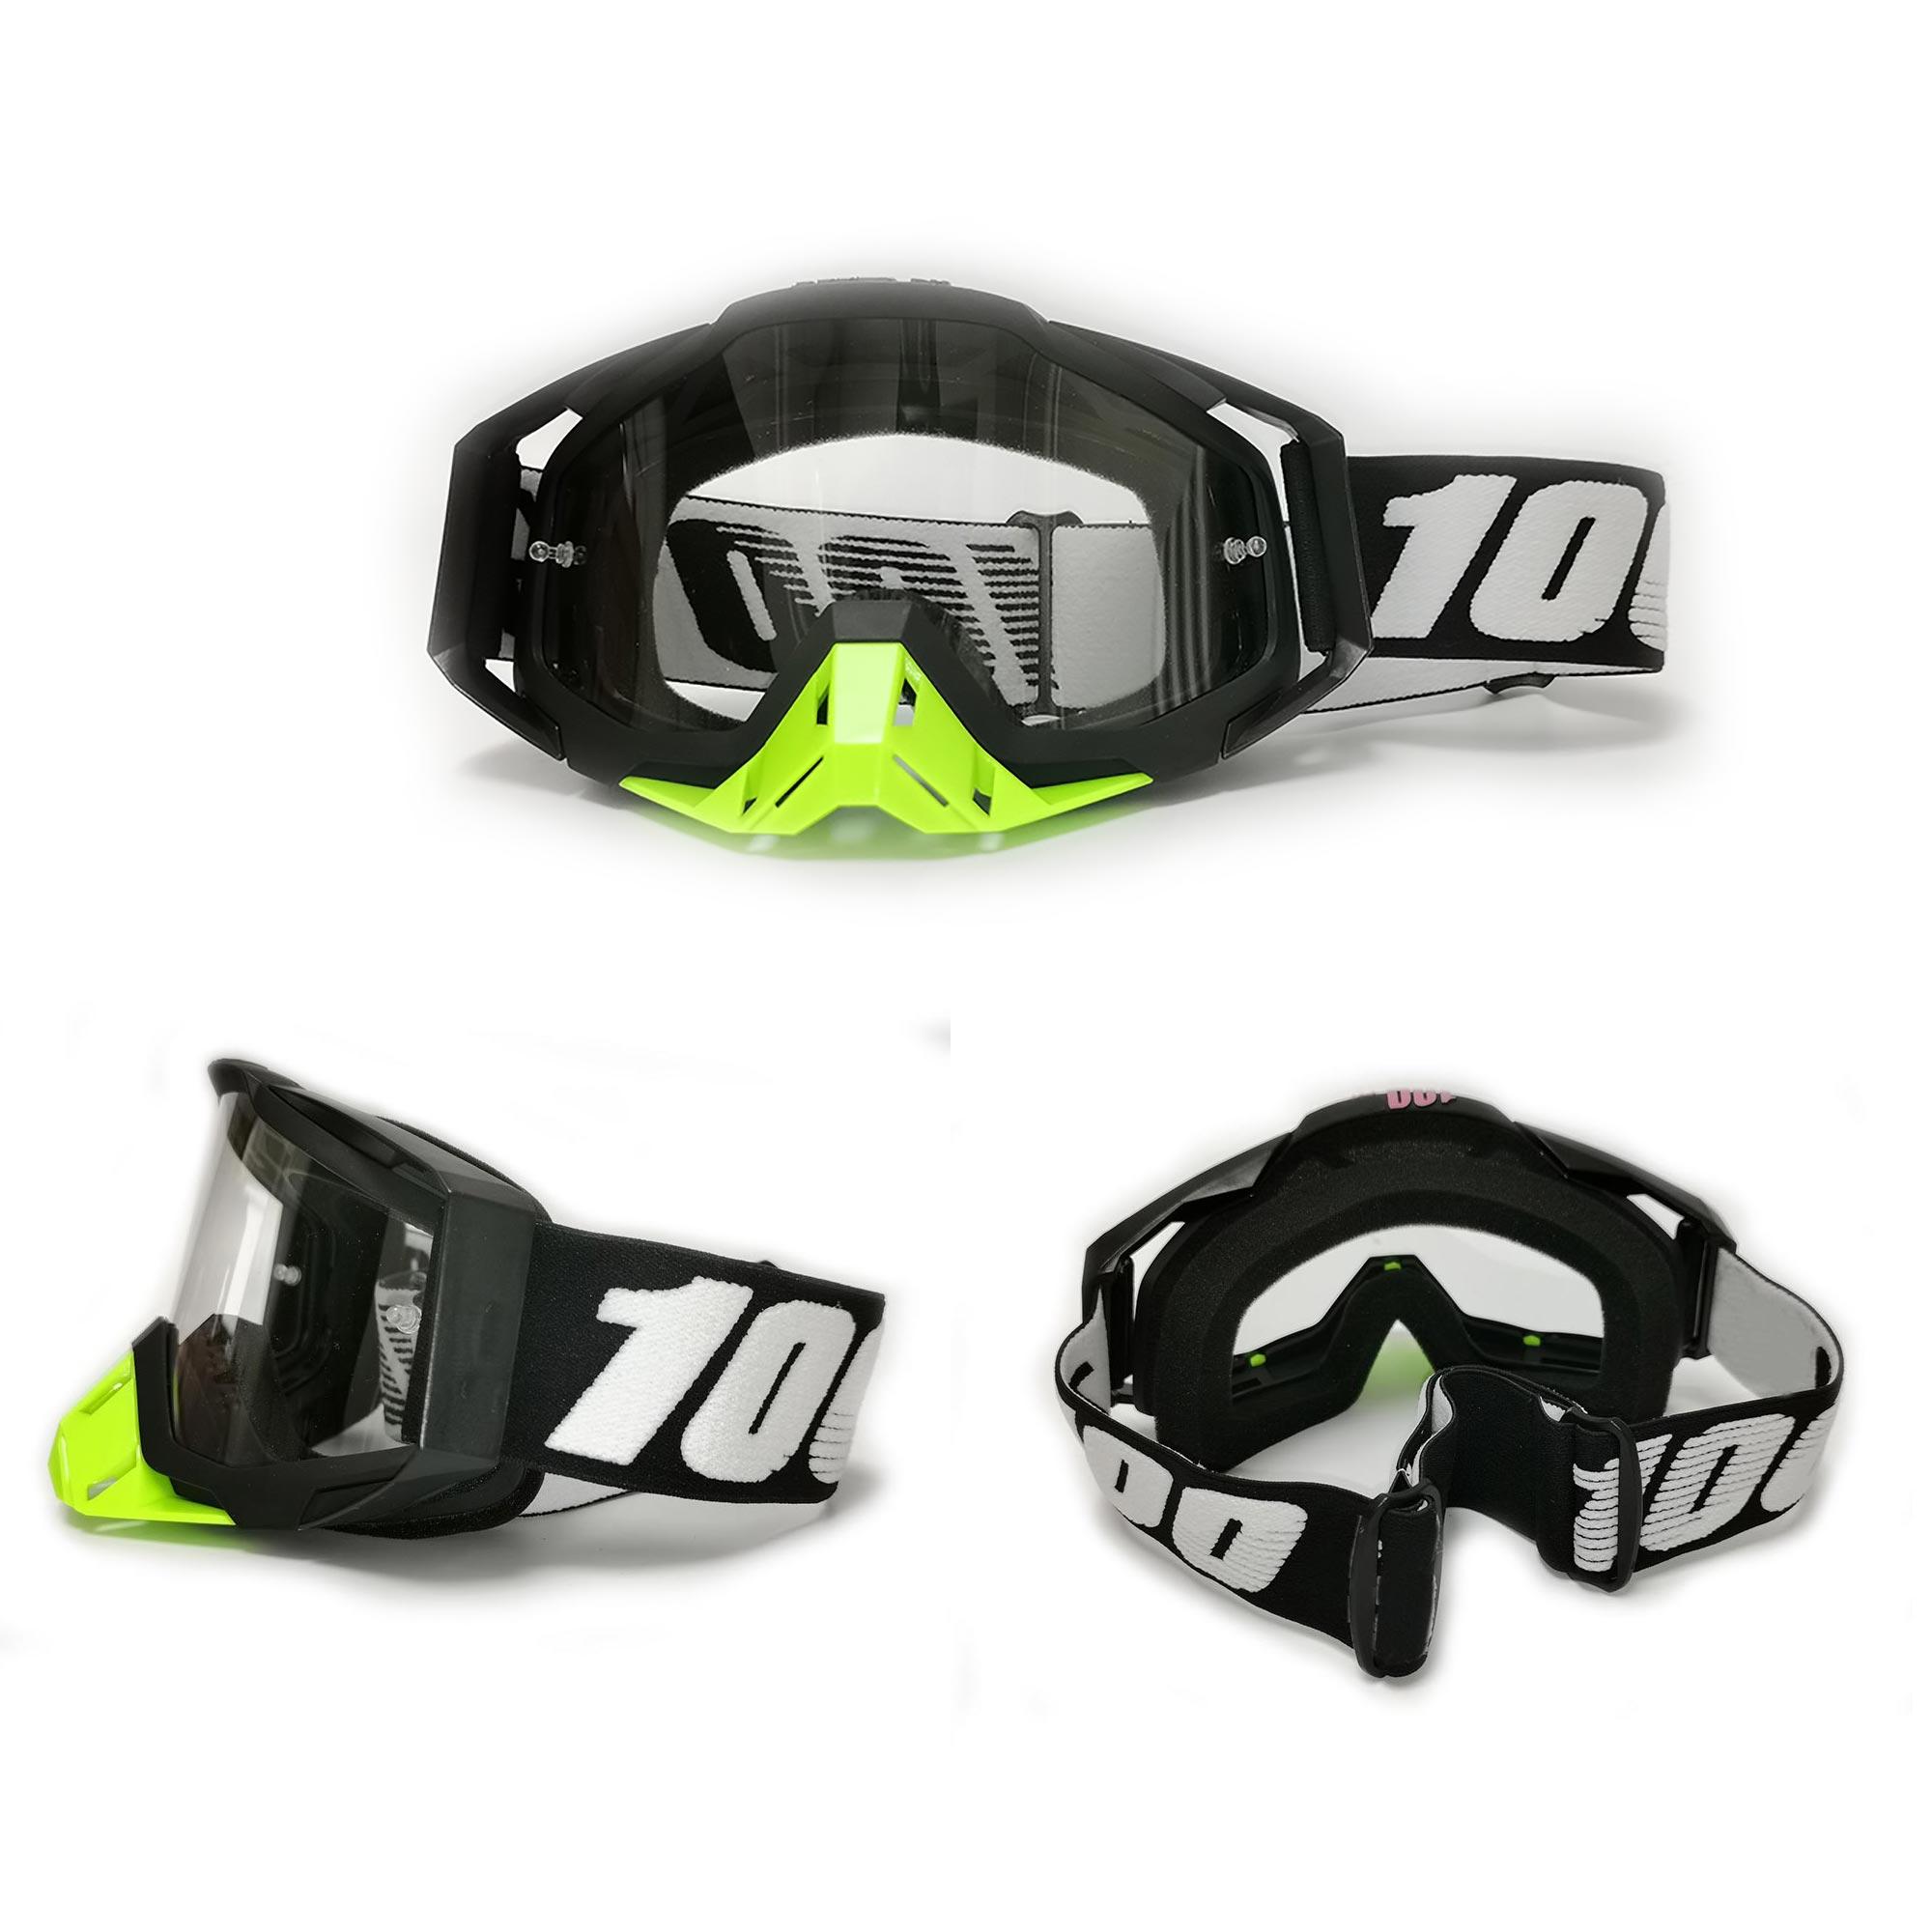 Motorcycles Goggles Motorcycles Glass Motorcycle Glasses Antiparras Mtb Man Glasses Cross Country Cycling Glasses Jet Ski